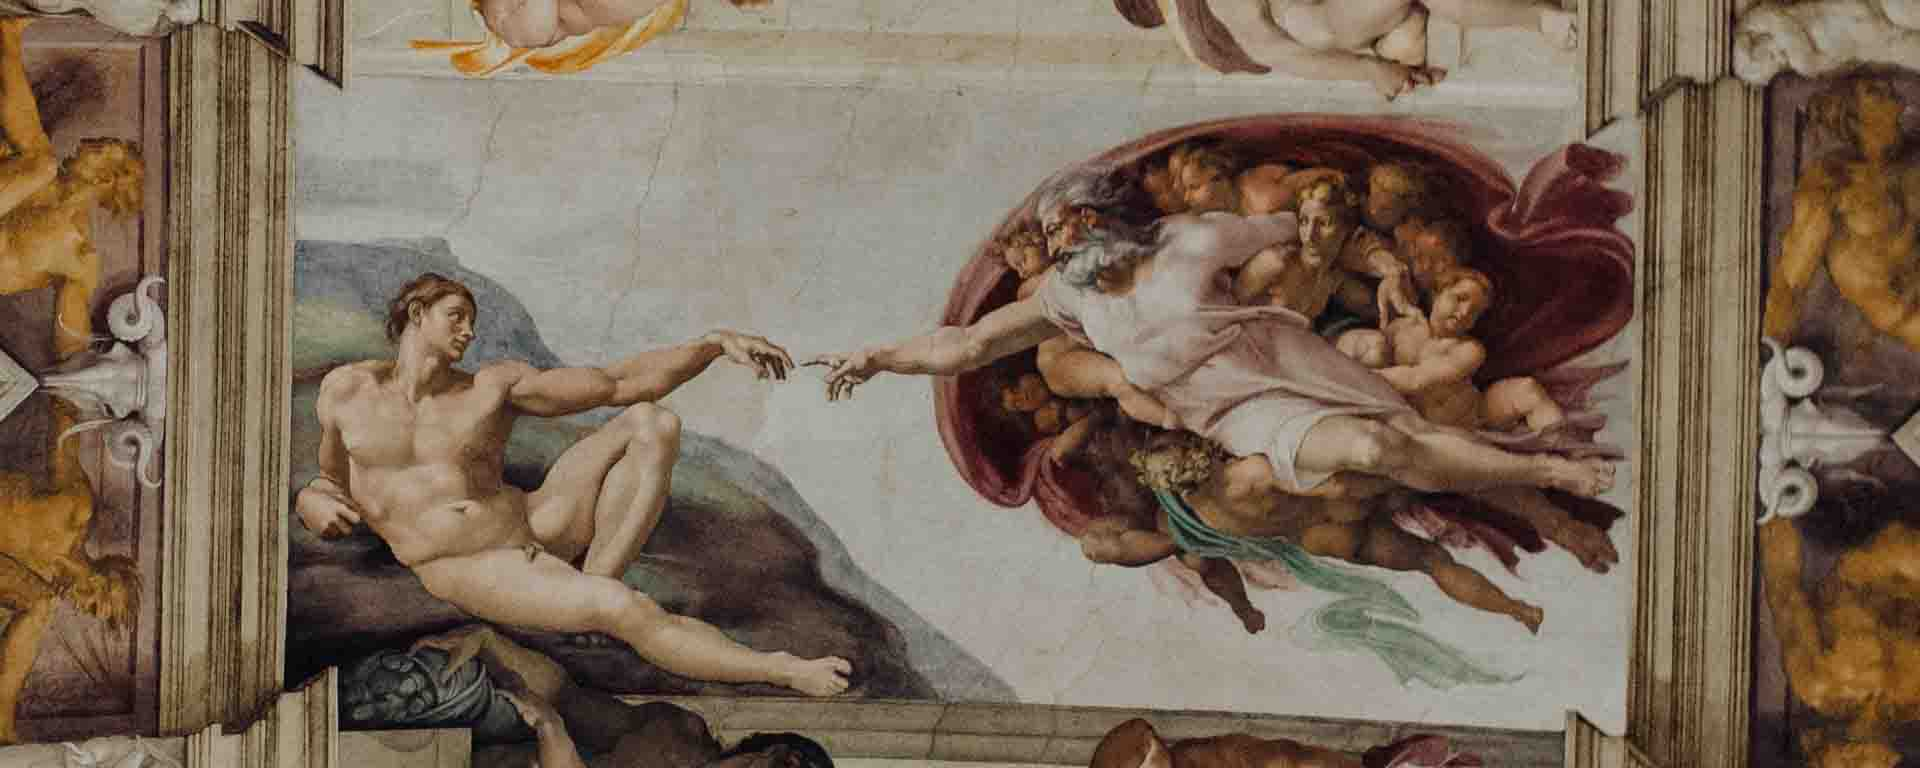 De schepping van Adam - Sixtijnse Kapel plafond